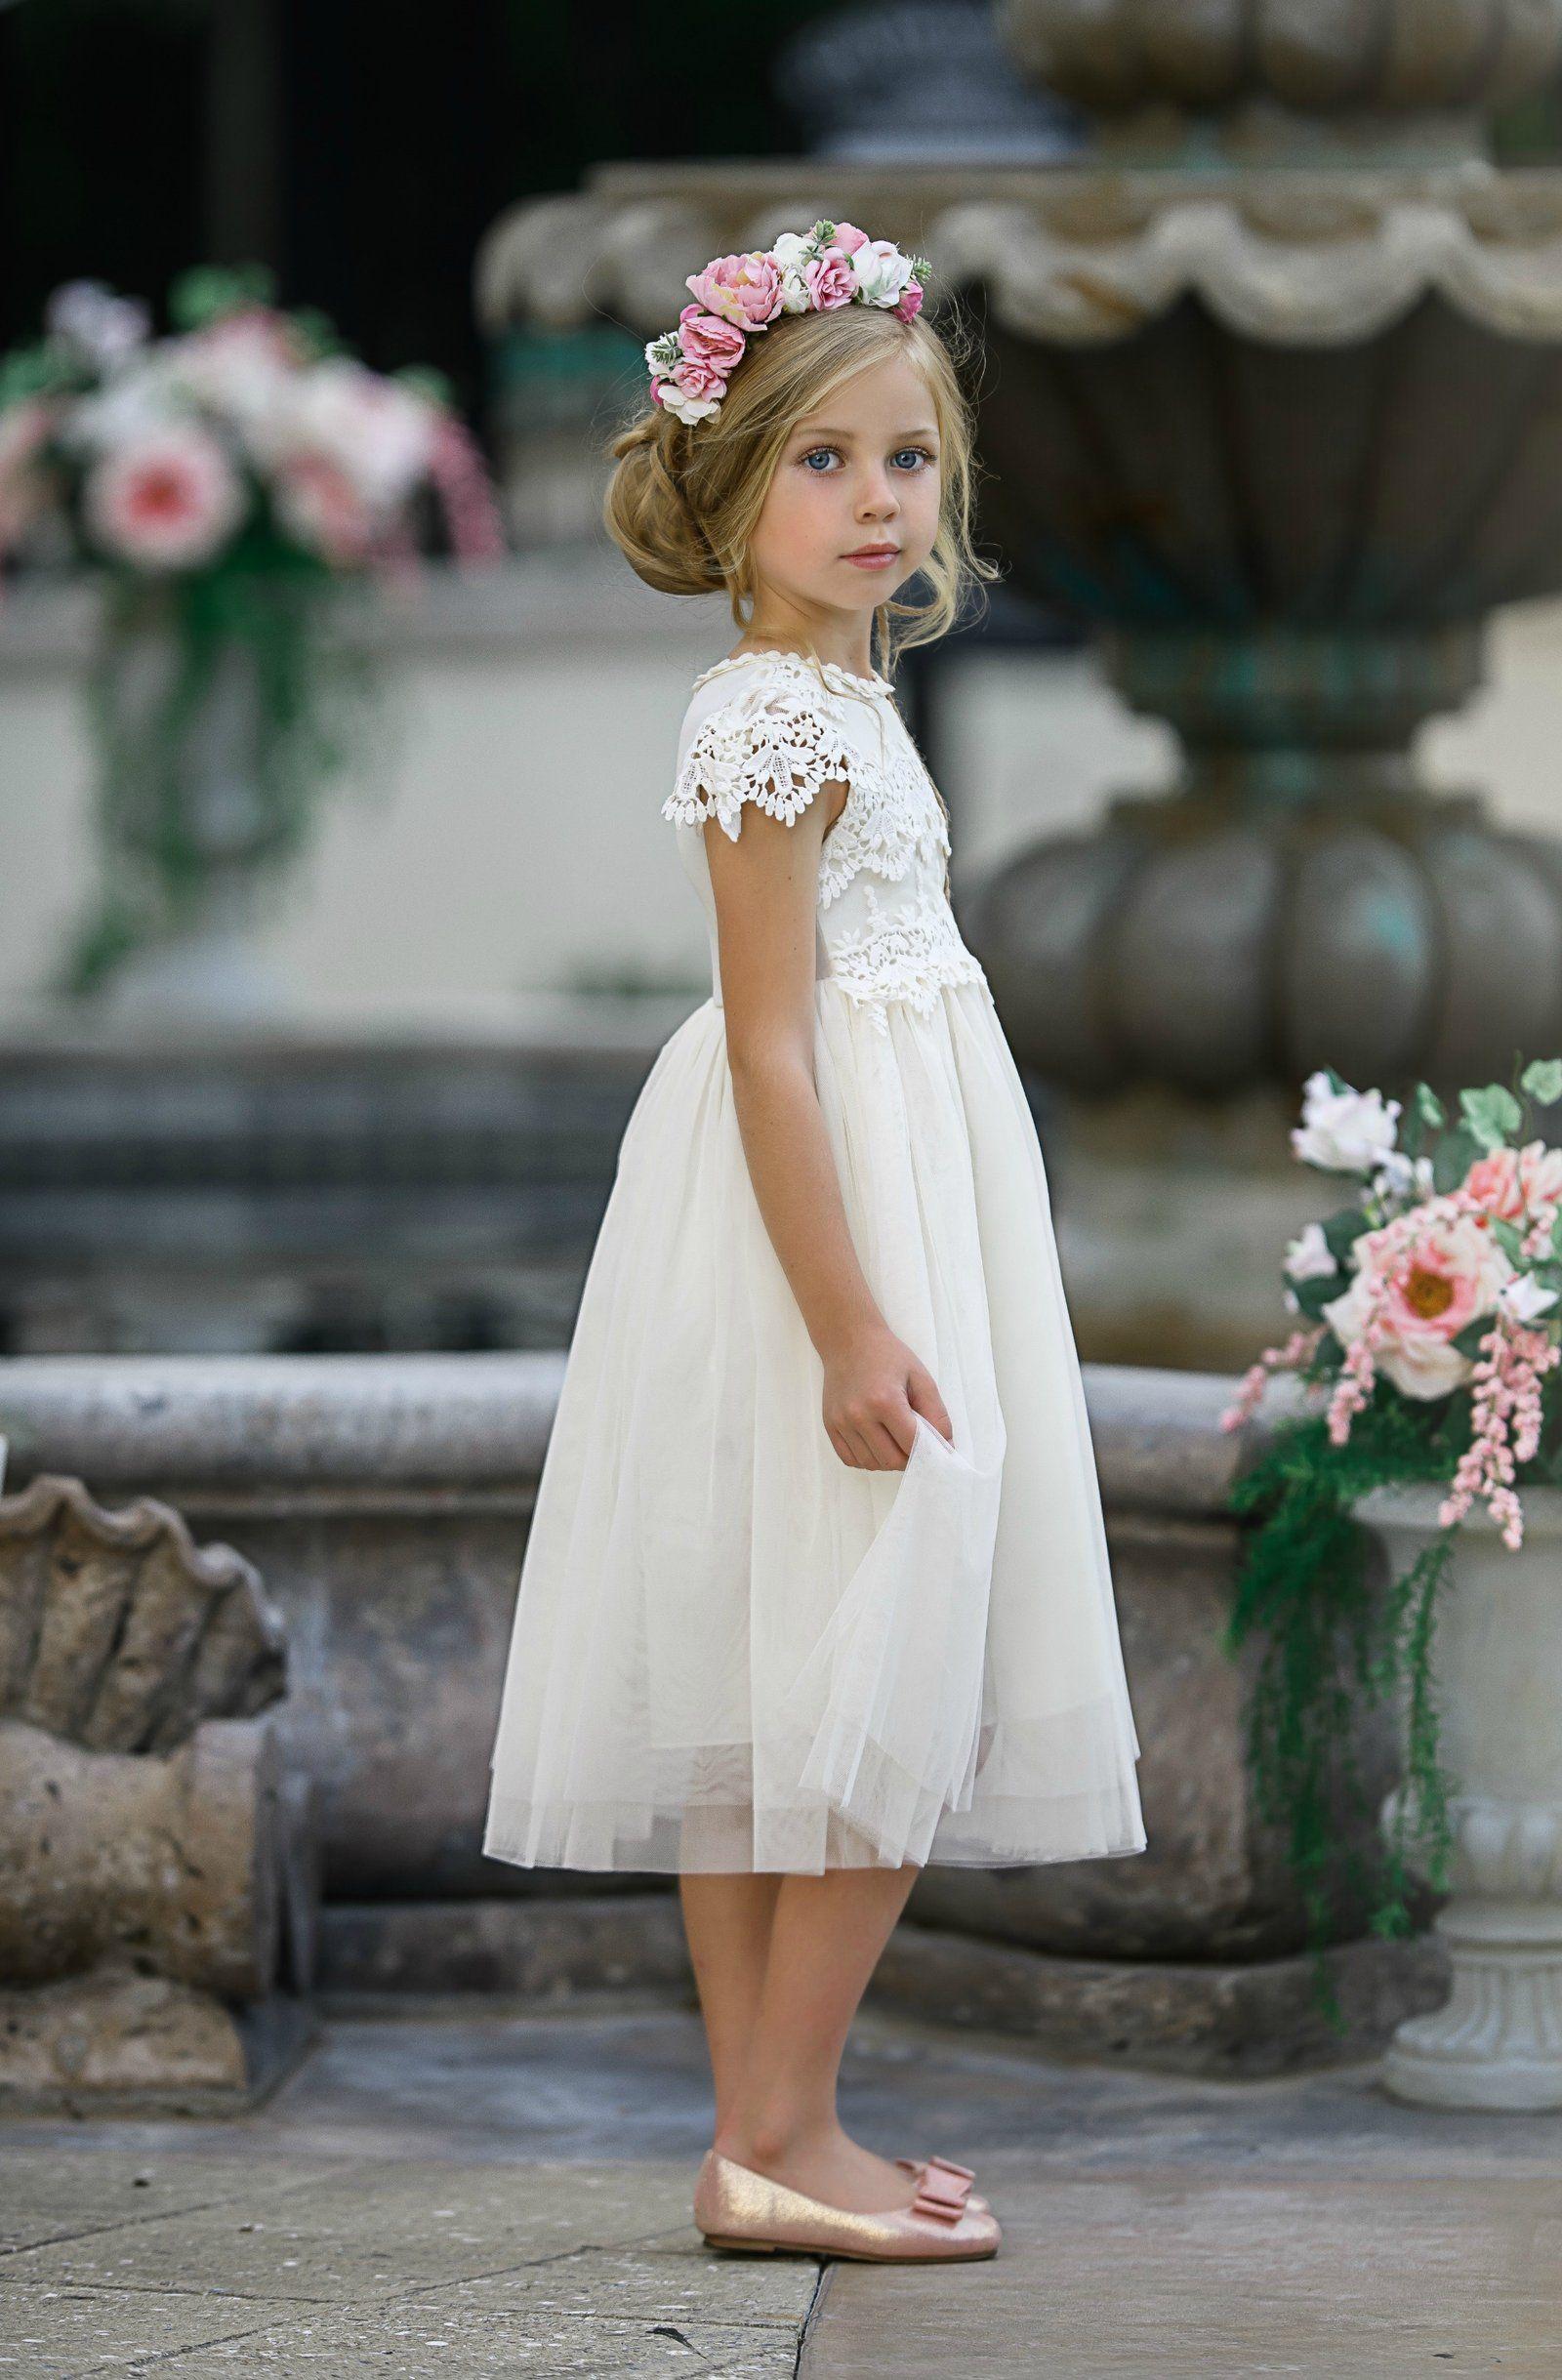 Luciana Cap Sleeve Lace Flower Girl Dress Ivory #20 ...  Ivory Lace Vintage Flower Girl Dress